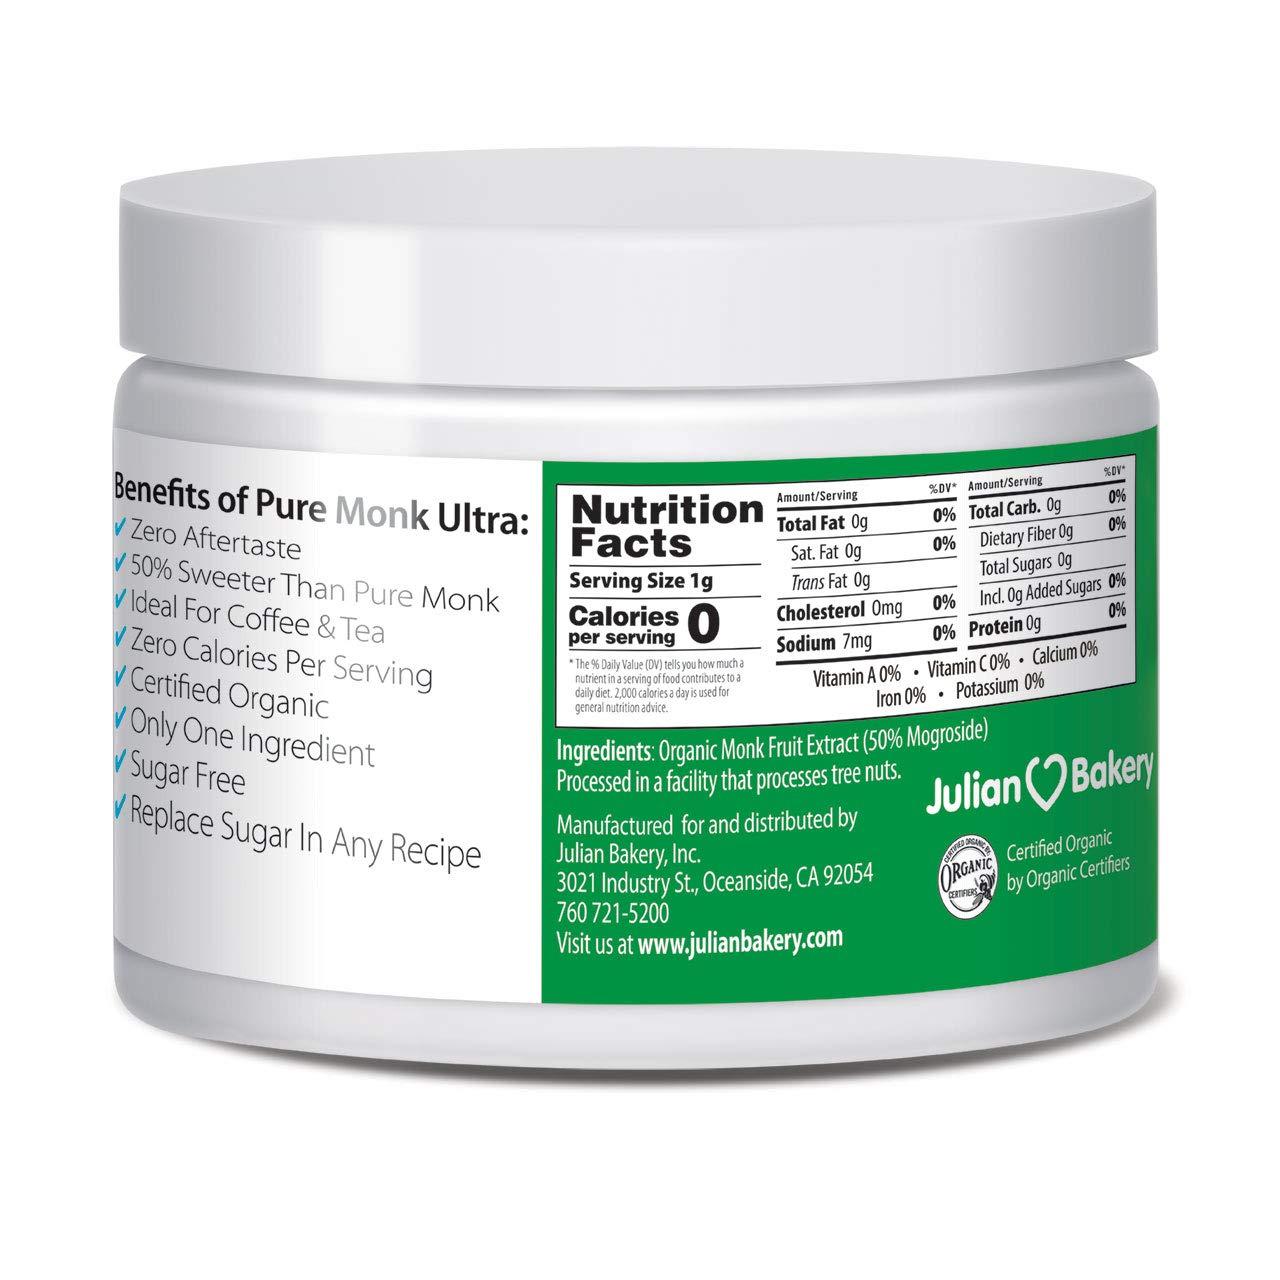 Pure Monk Ultra (Organic) (v50% Monk Fruit Extract) (0g Sugar) Sweetener 2.65 oz (75 Servings) by Julian Bakery (Image #2)